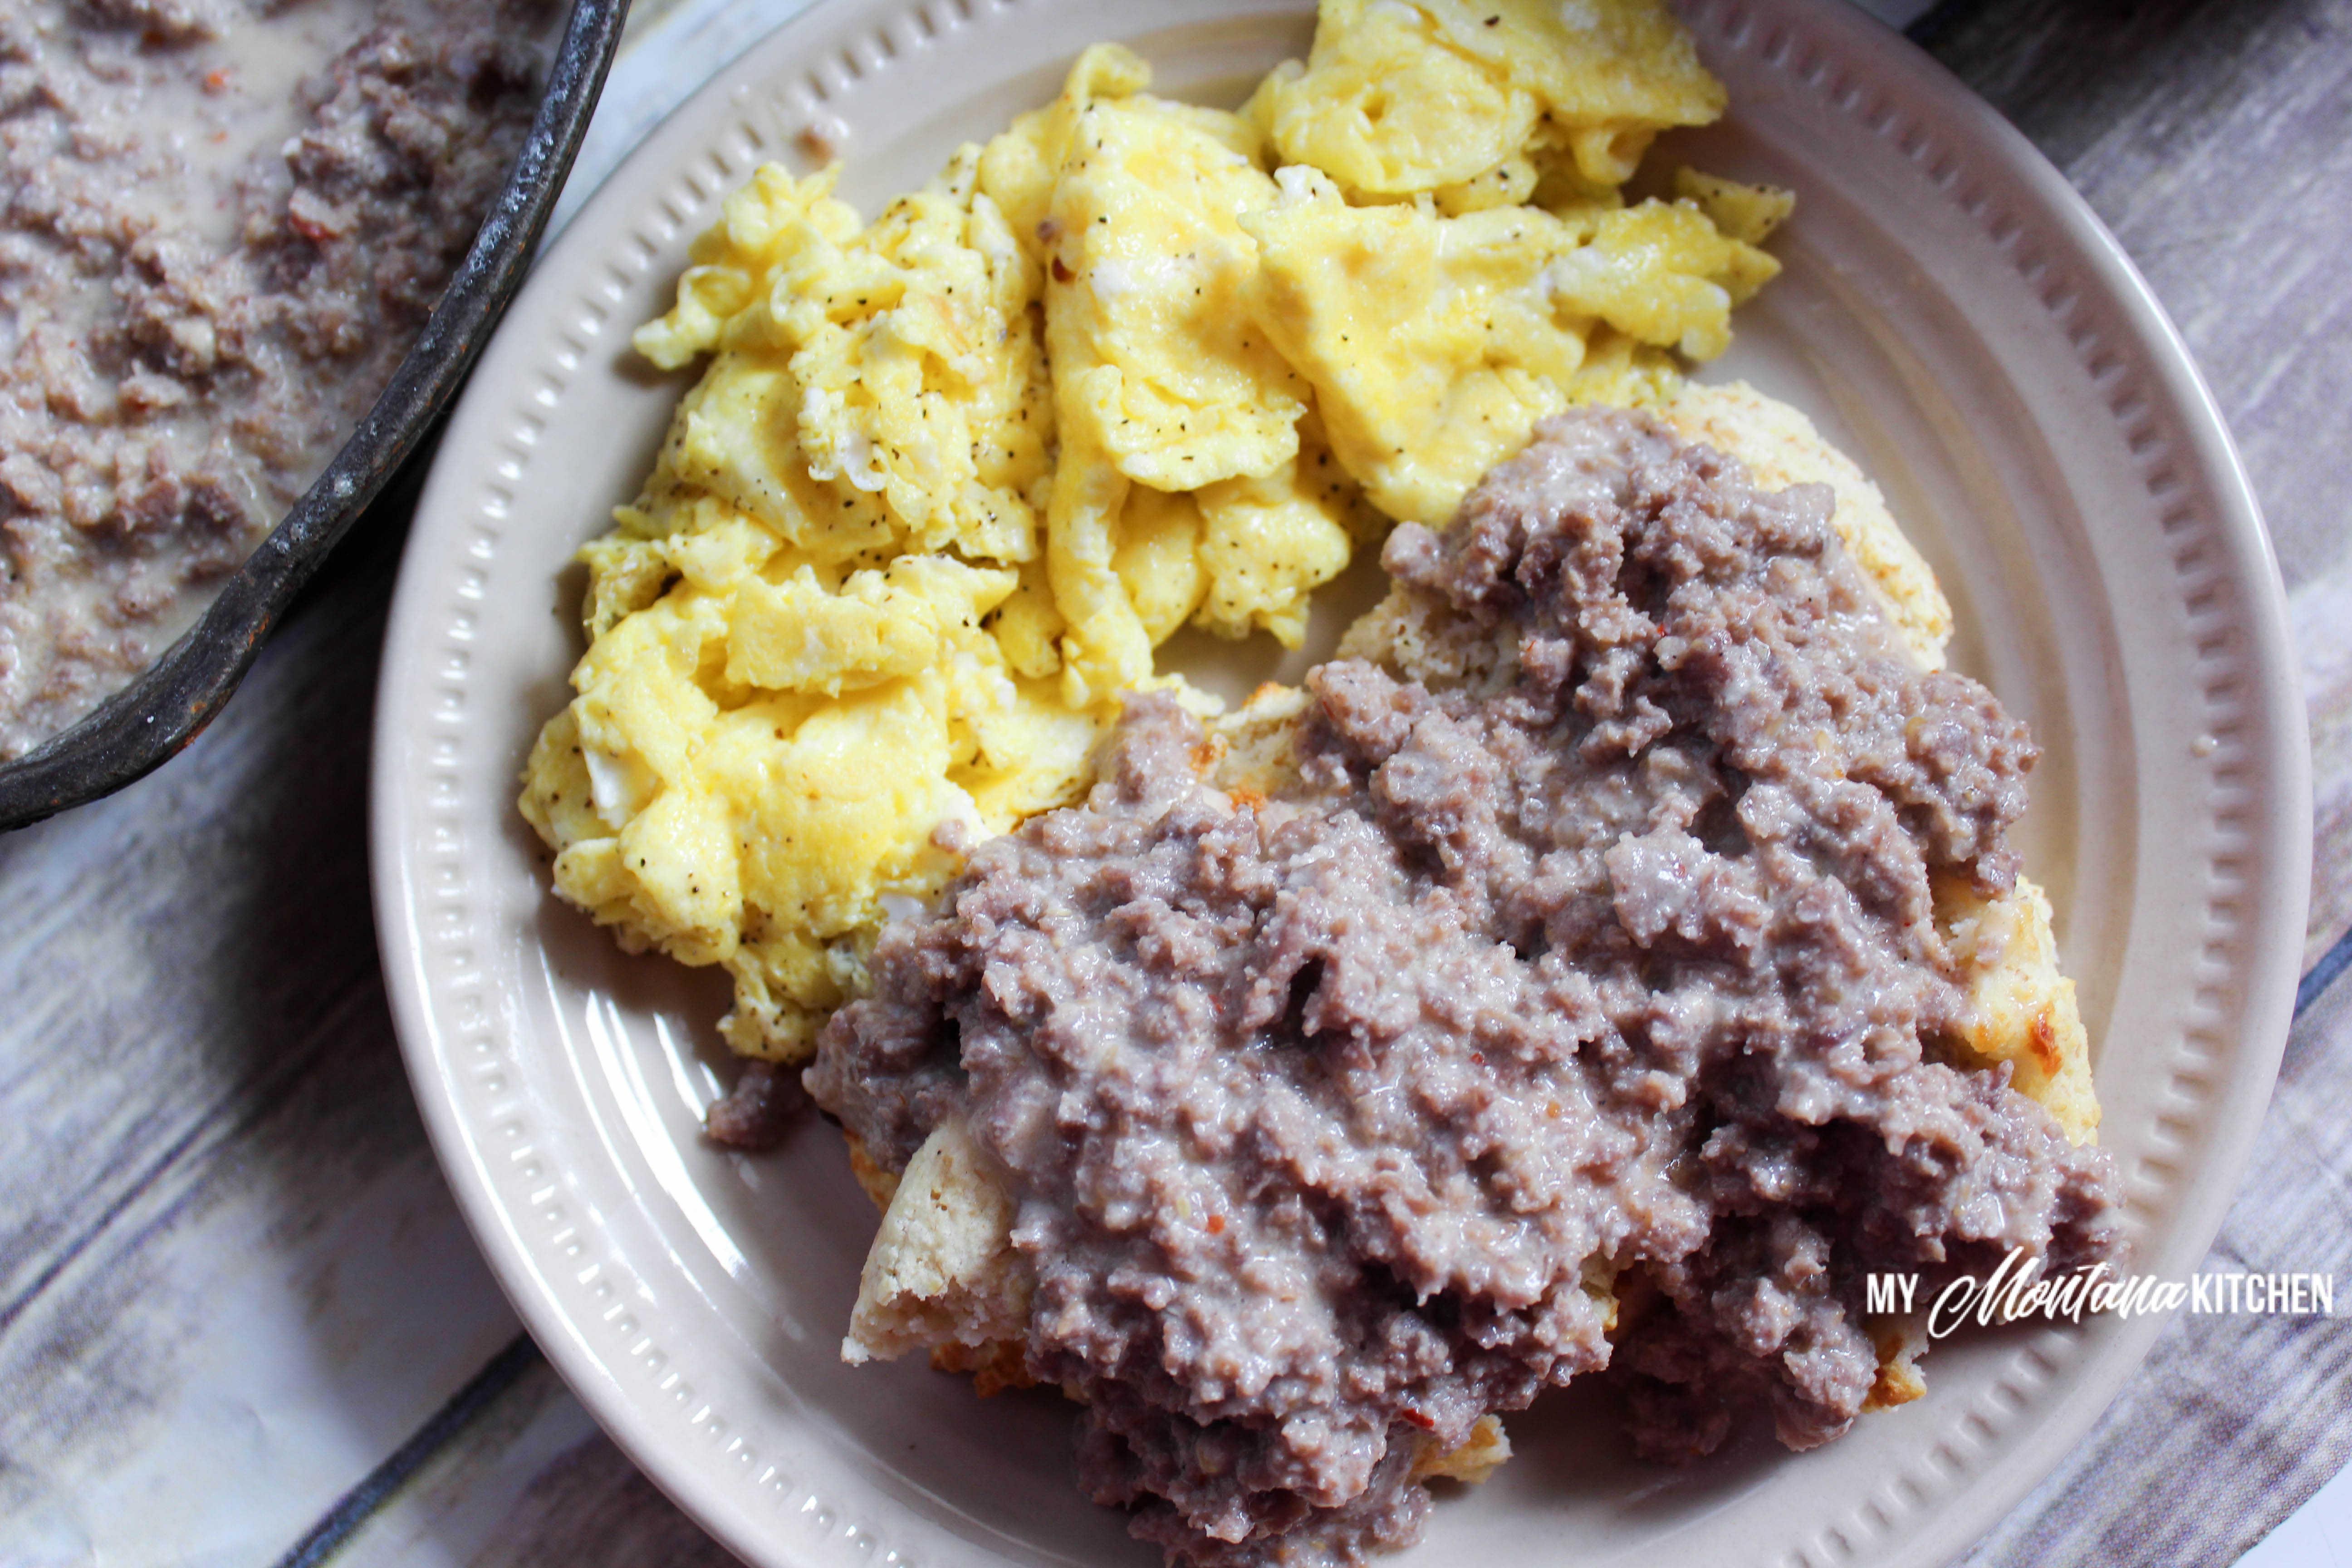 Low Carb Sausage Gravy (THM-S, Gluten Free) #trimhealthymama #thm #thm-s #lowcarb #lowcarbgravy #sausage #sausagegravy #mymontanakitchen